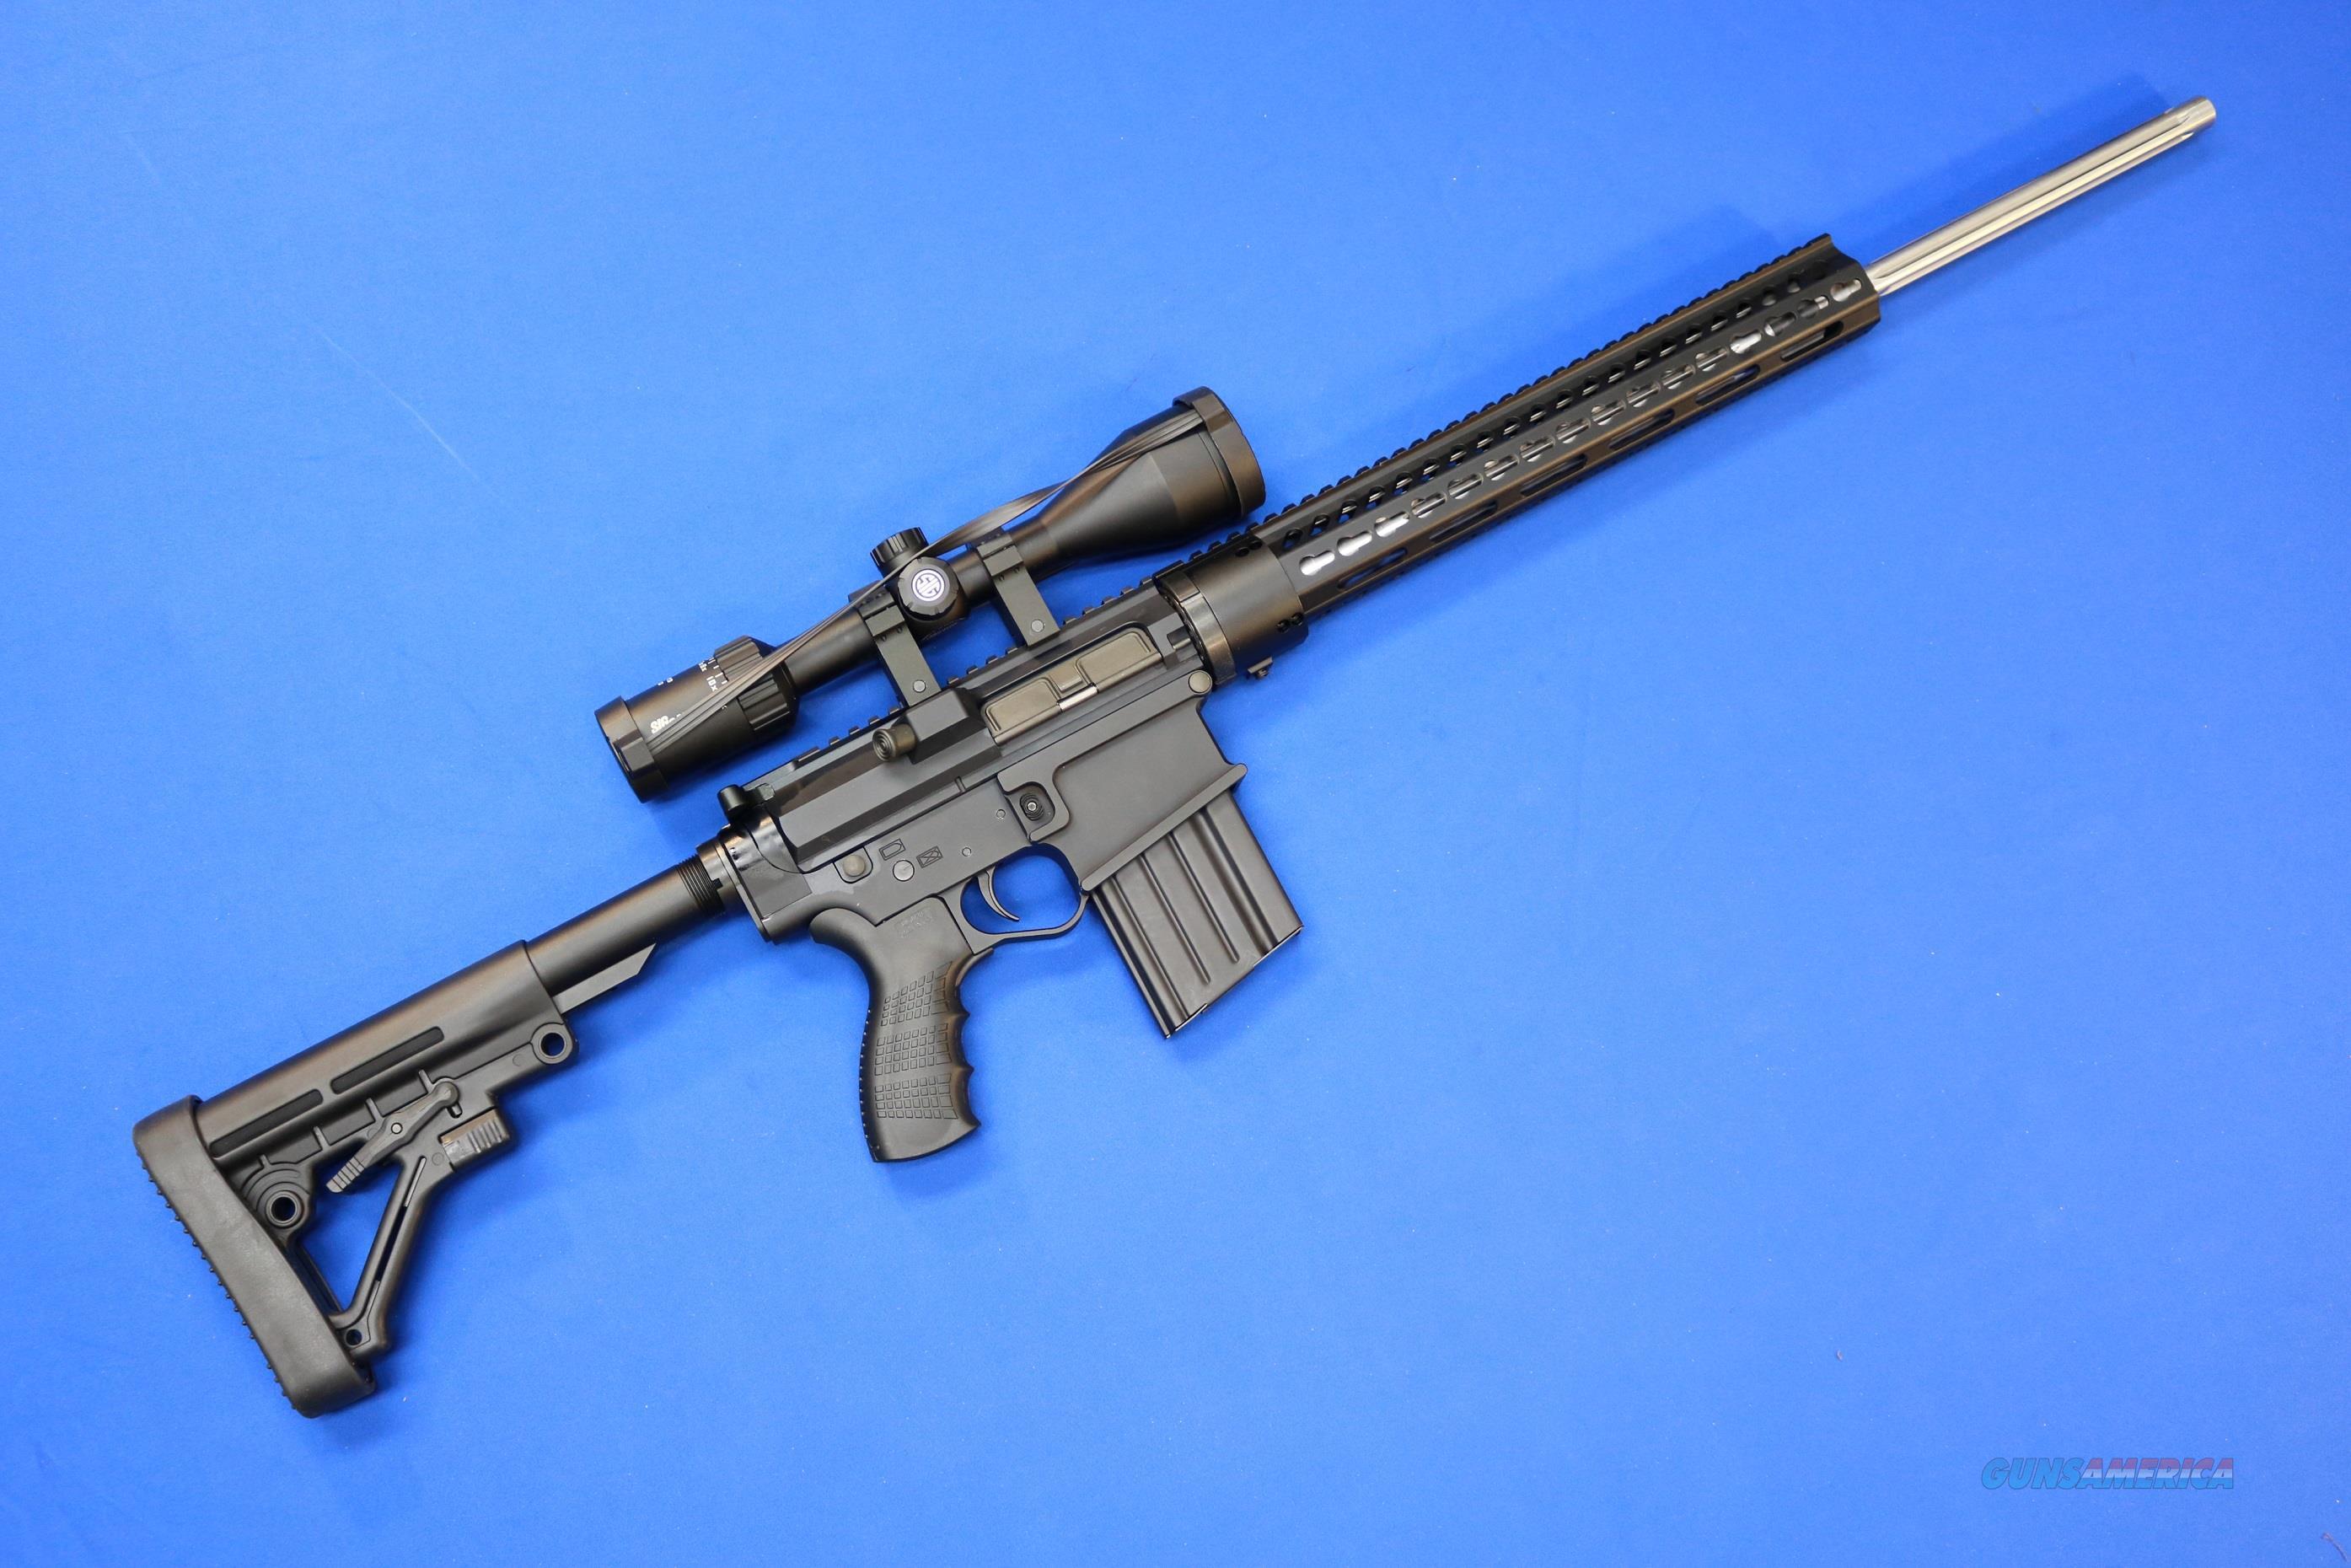 F&W GUNS CUSTOM FW-10 .308 WIN w/SIG SAUER OPTIC  Guns > Rifles > AR-15 Rifles - Small Manufacturers > Complete Rifle